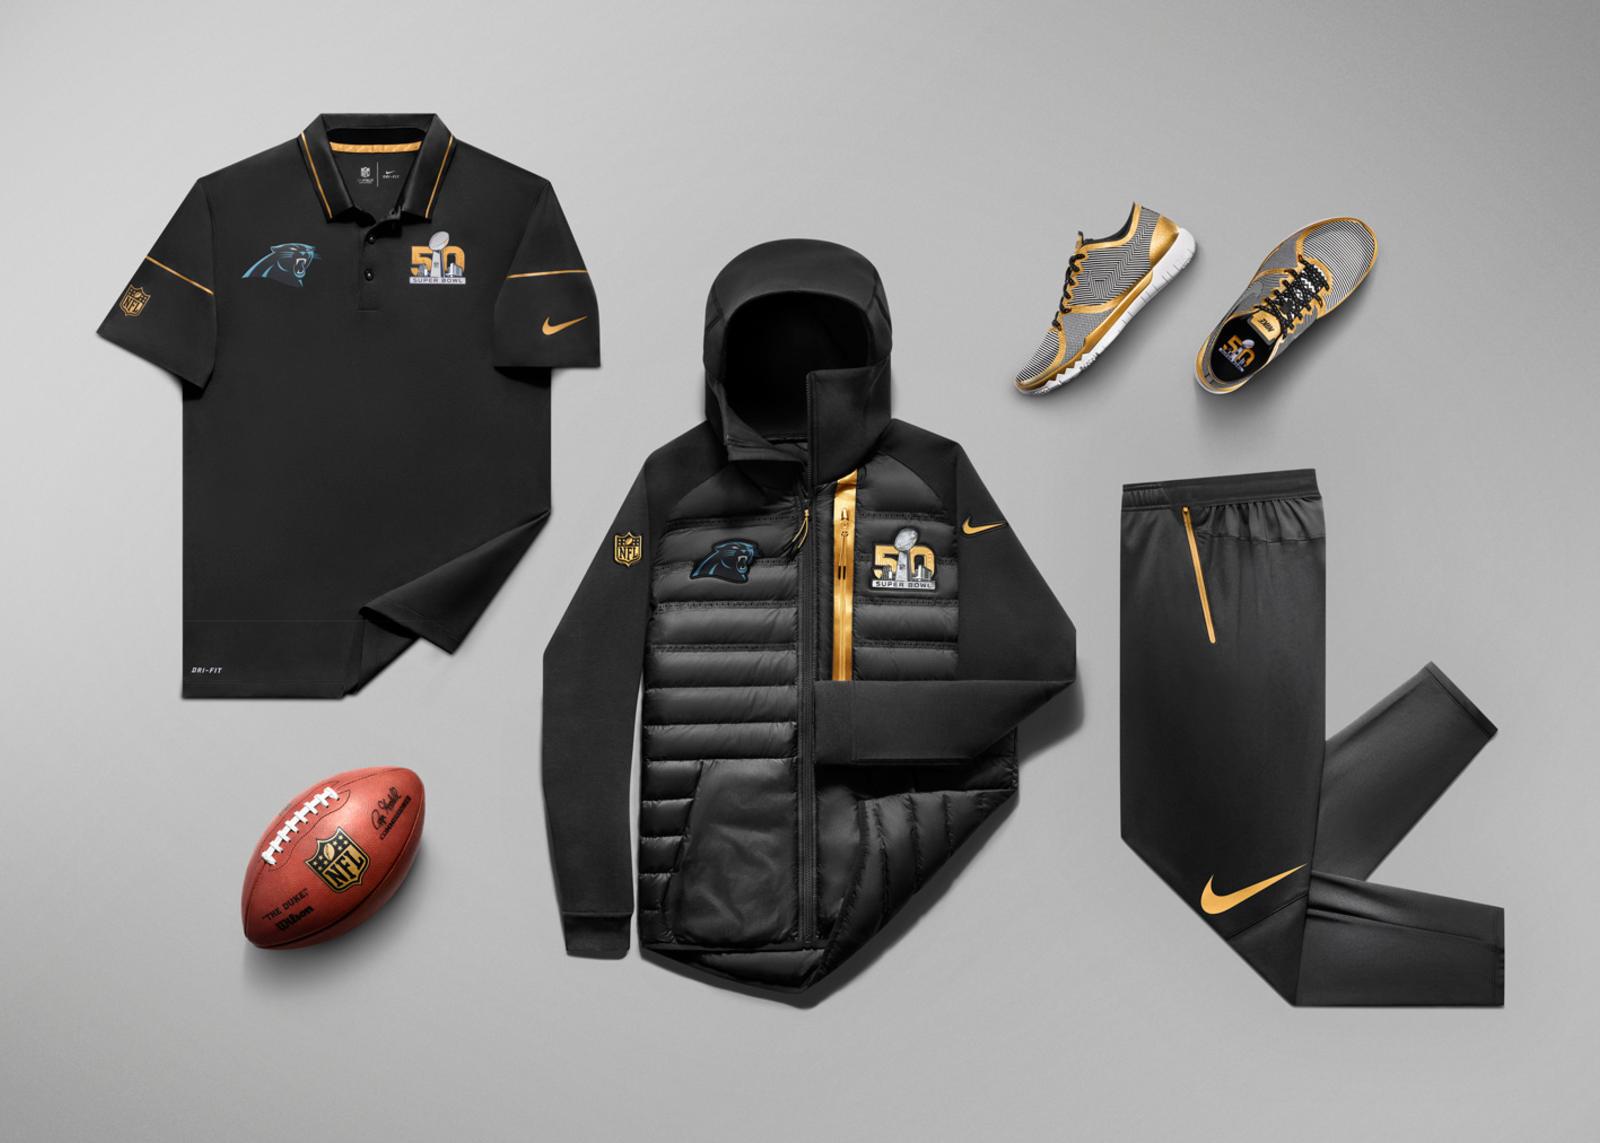 "reputable site c07f8 e3be4 A pocas semanas del tan anticipado evento deportivo, hemos podido echarle  un vistazo a la especial colección ""Super Bowl 50 Nike Gold Collection"" que  ha ..."